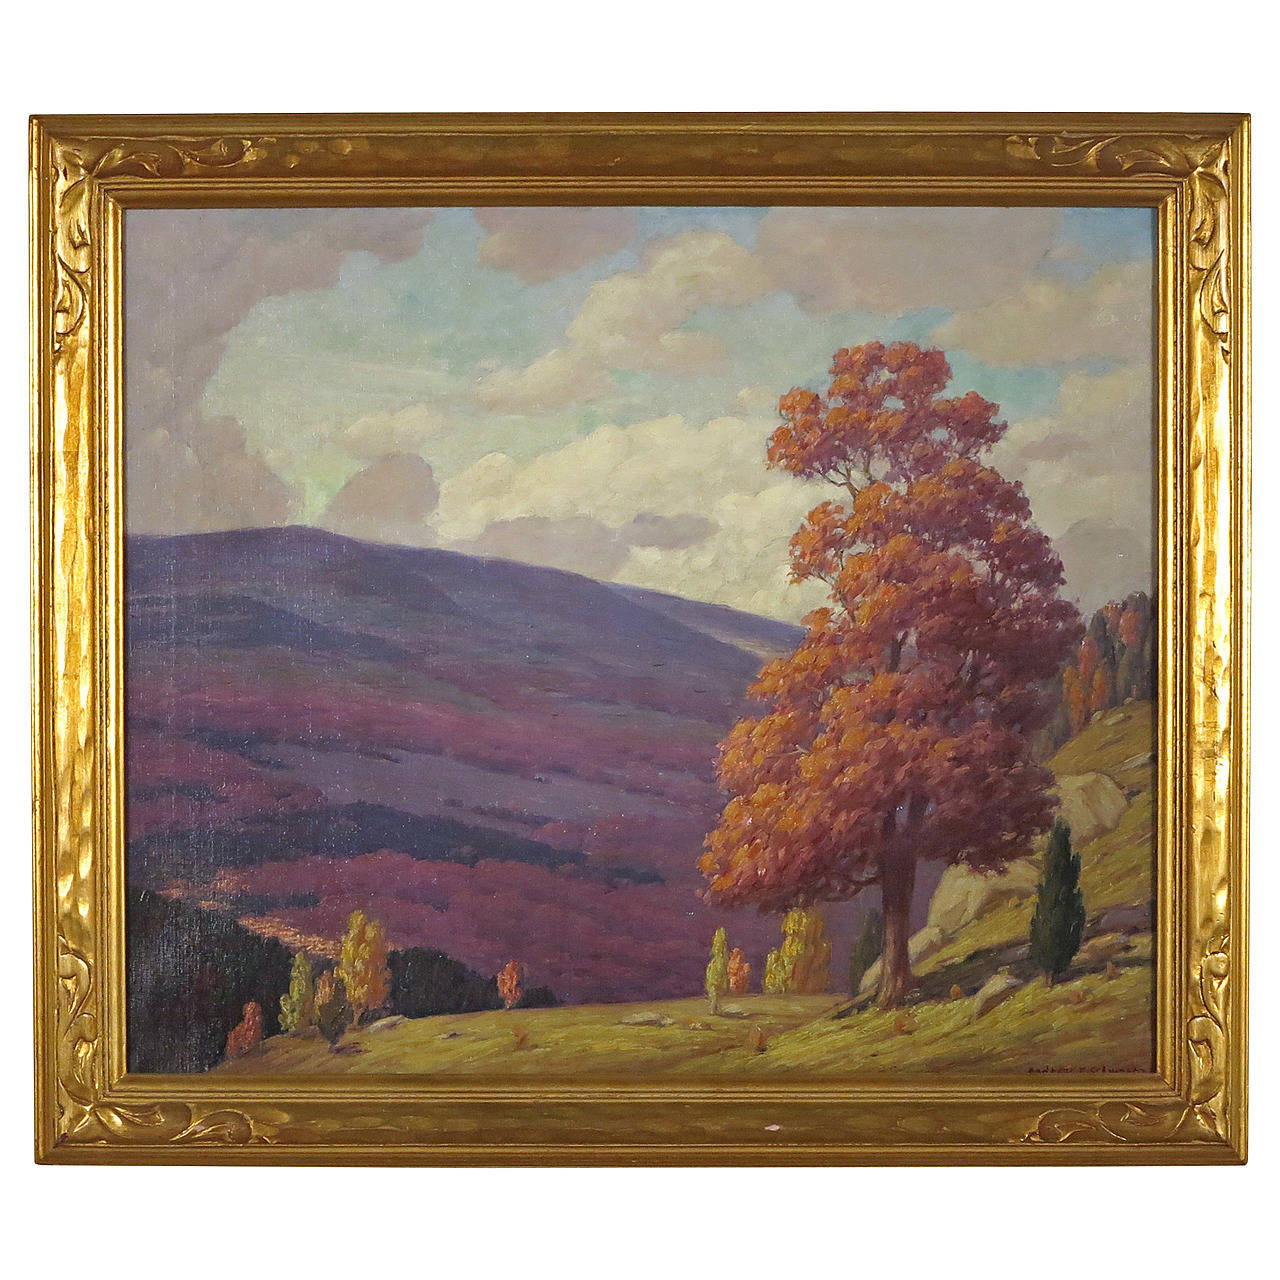 Blue Ridge Mountains, Virginia Painting by Andrew Thomas Schwartz